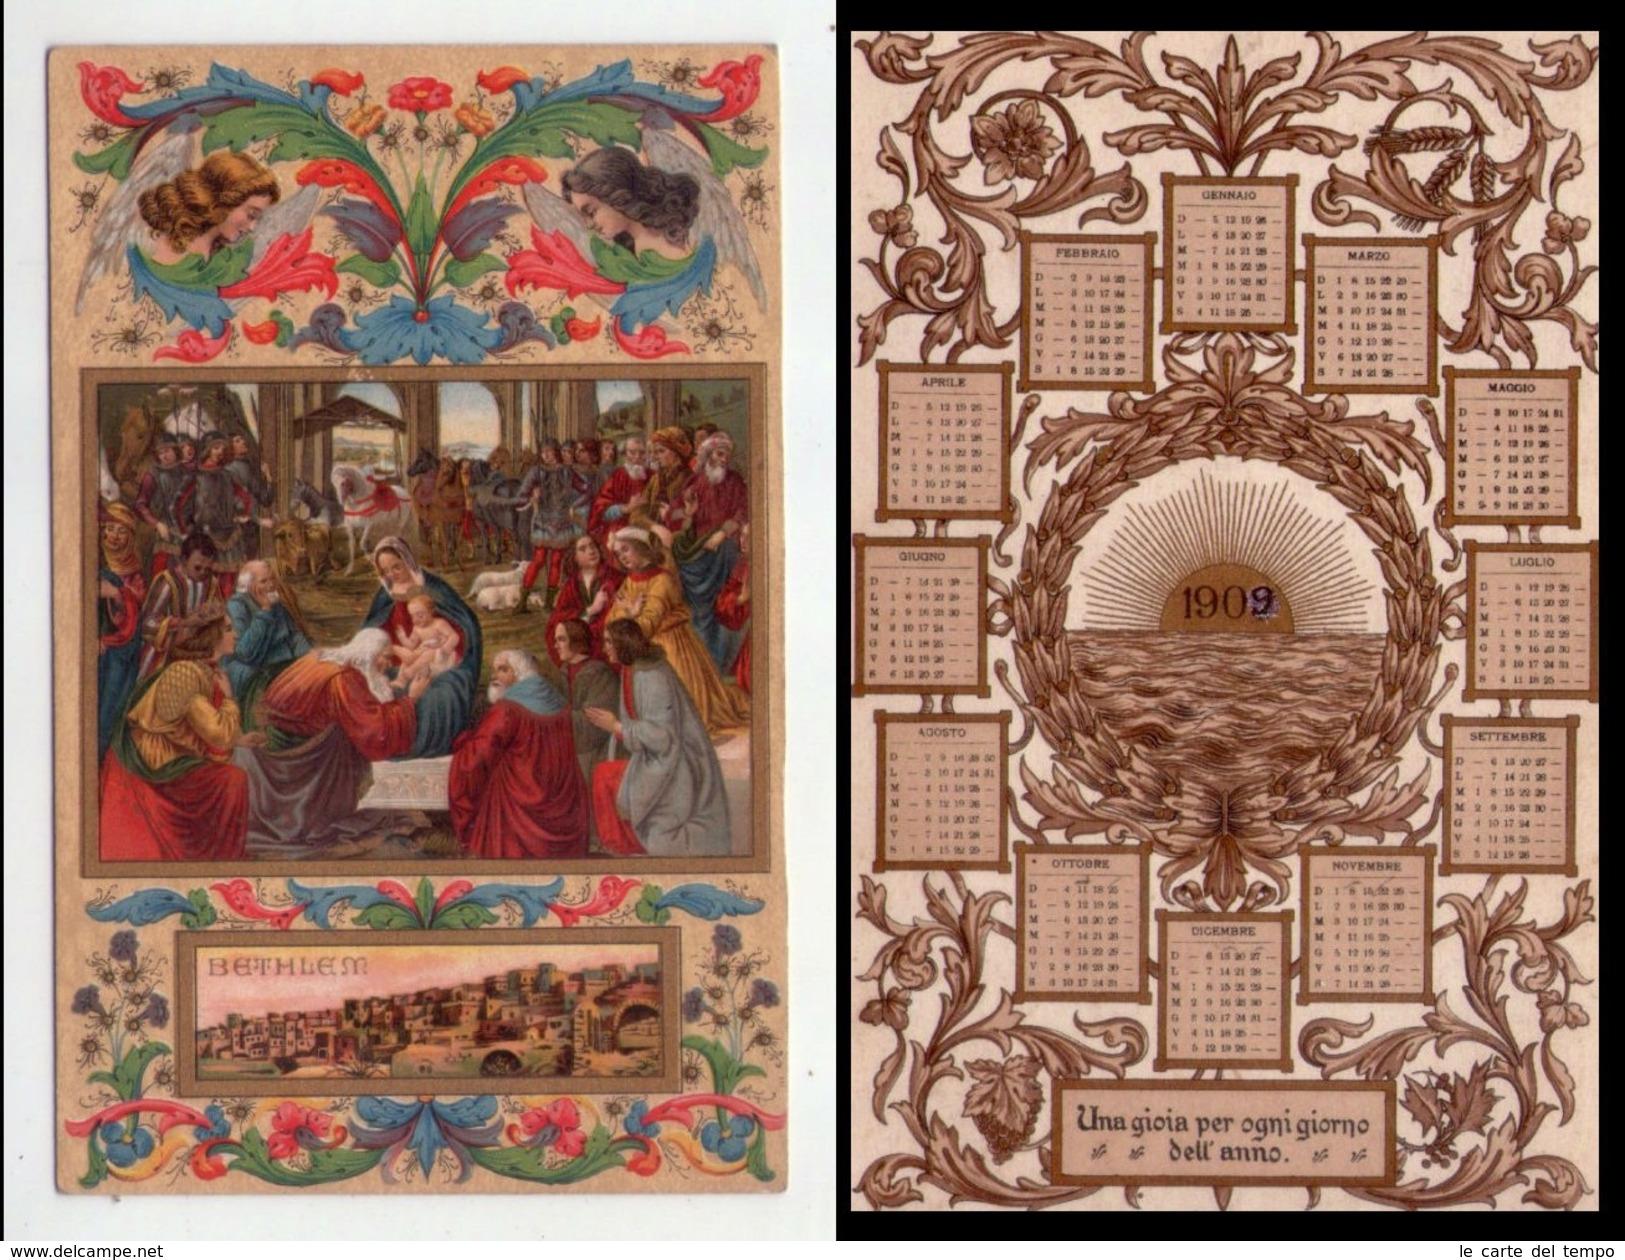 Cartolina/calendario Sacra Famiglia - Natività - Bethlem. 1909 - Calendari